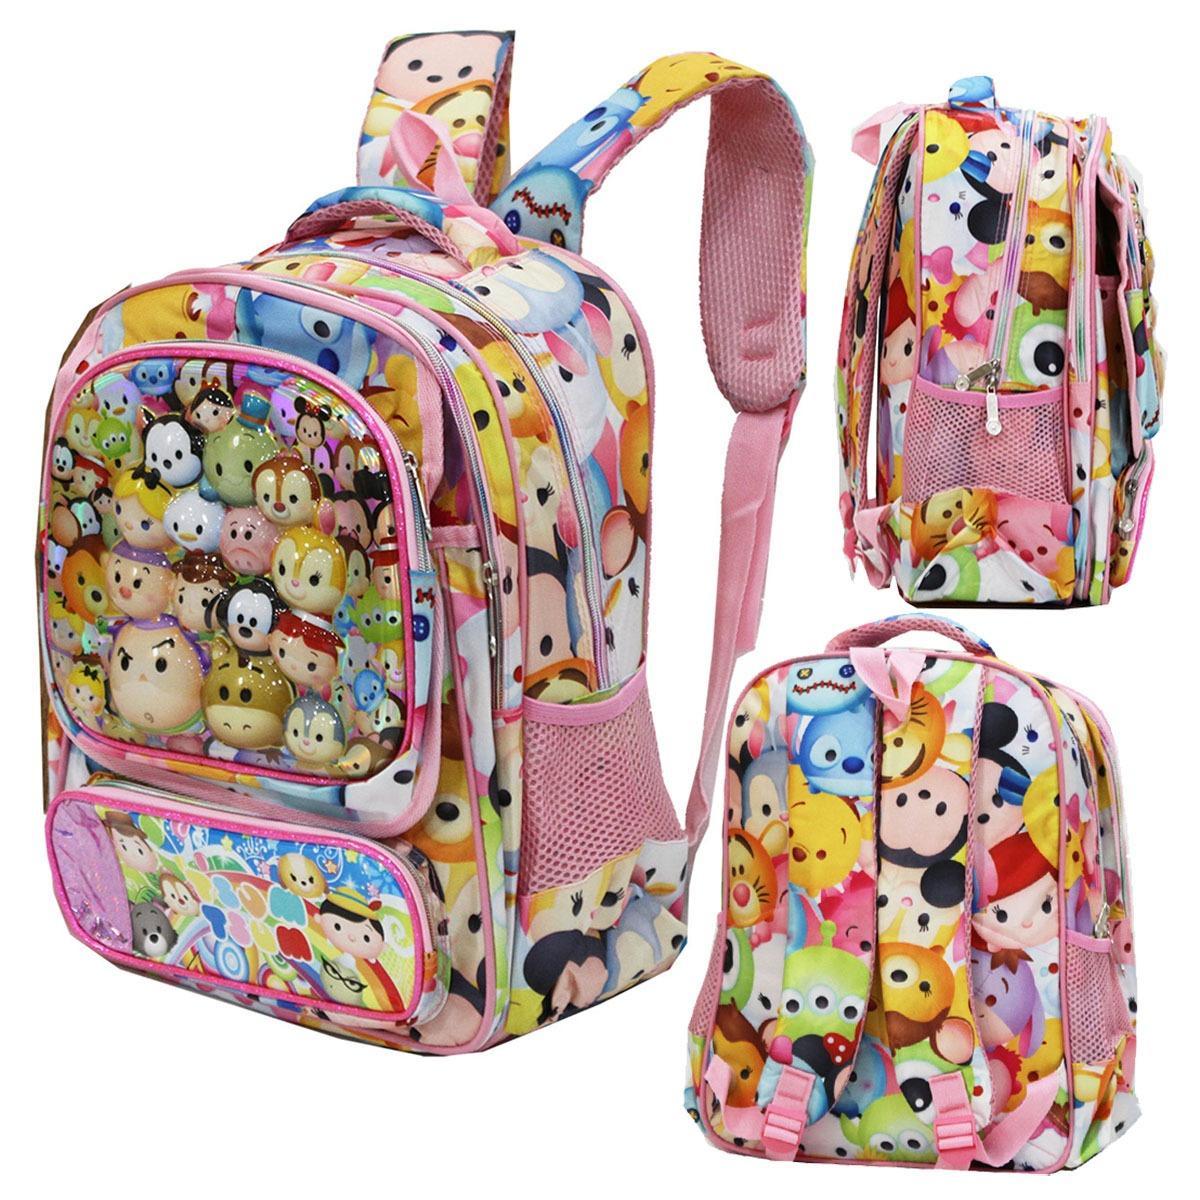 Onlan Tas Trolley Ukuran Anak Sekolah SD Bahan Saten ada 4 Kantung - Pink Onlan Tas Anak Sekolah SD Tsum 5D Timbul 4 Kantung Import